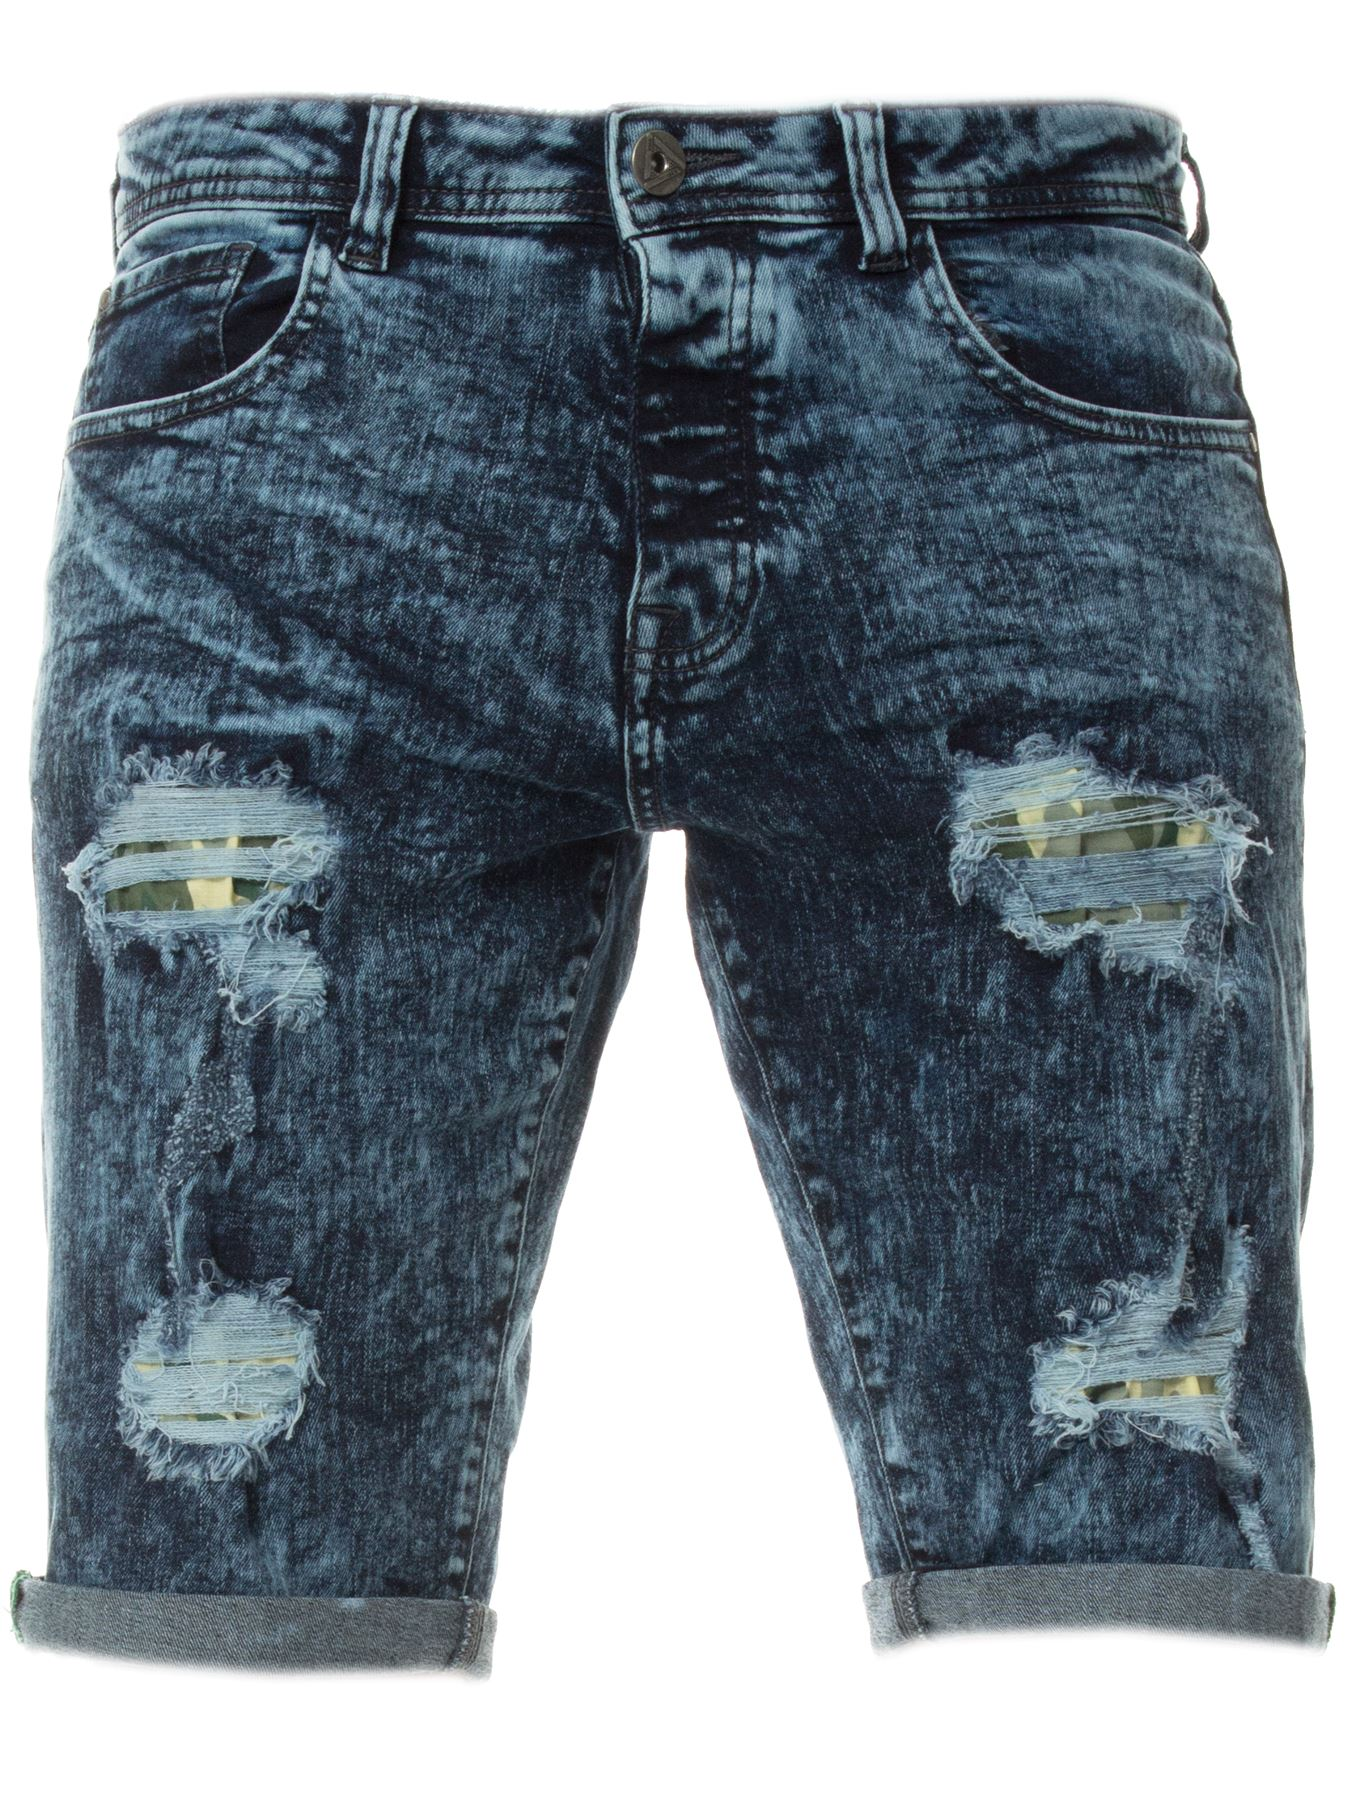 Mens-Denim-Shorts-ETO-Jeans-Stretch-Slim-Fit-Distressed-Ripped-Blue-Half-Pants thumbnail 4